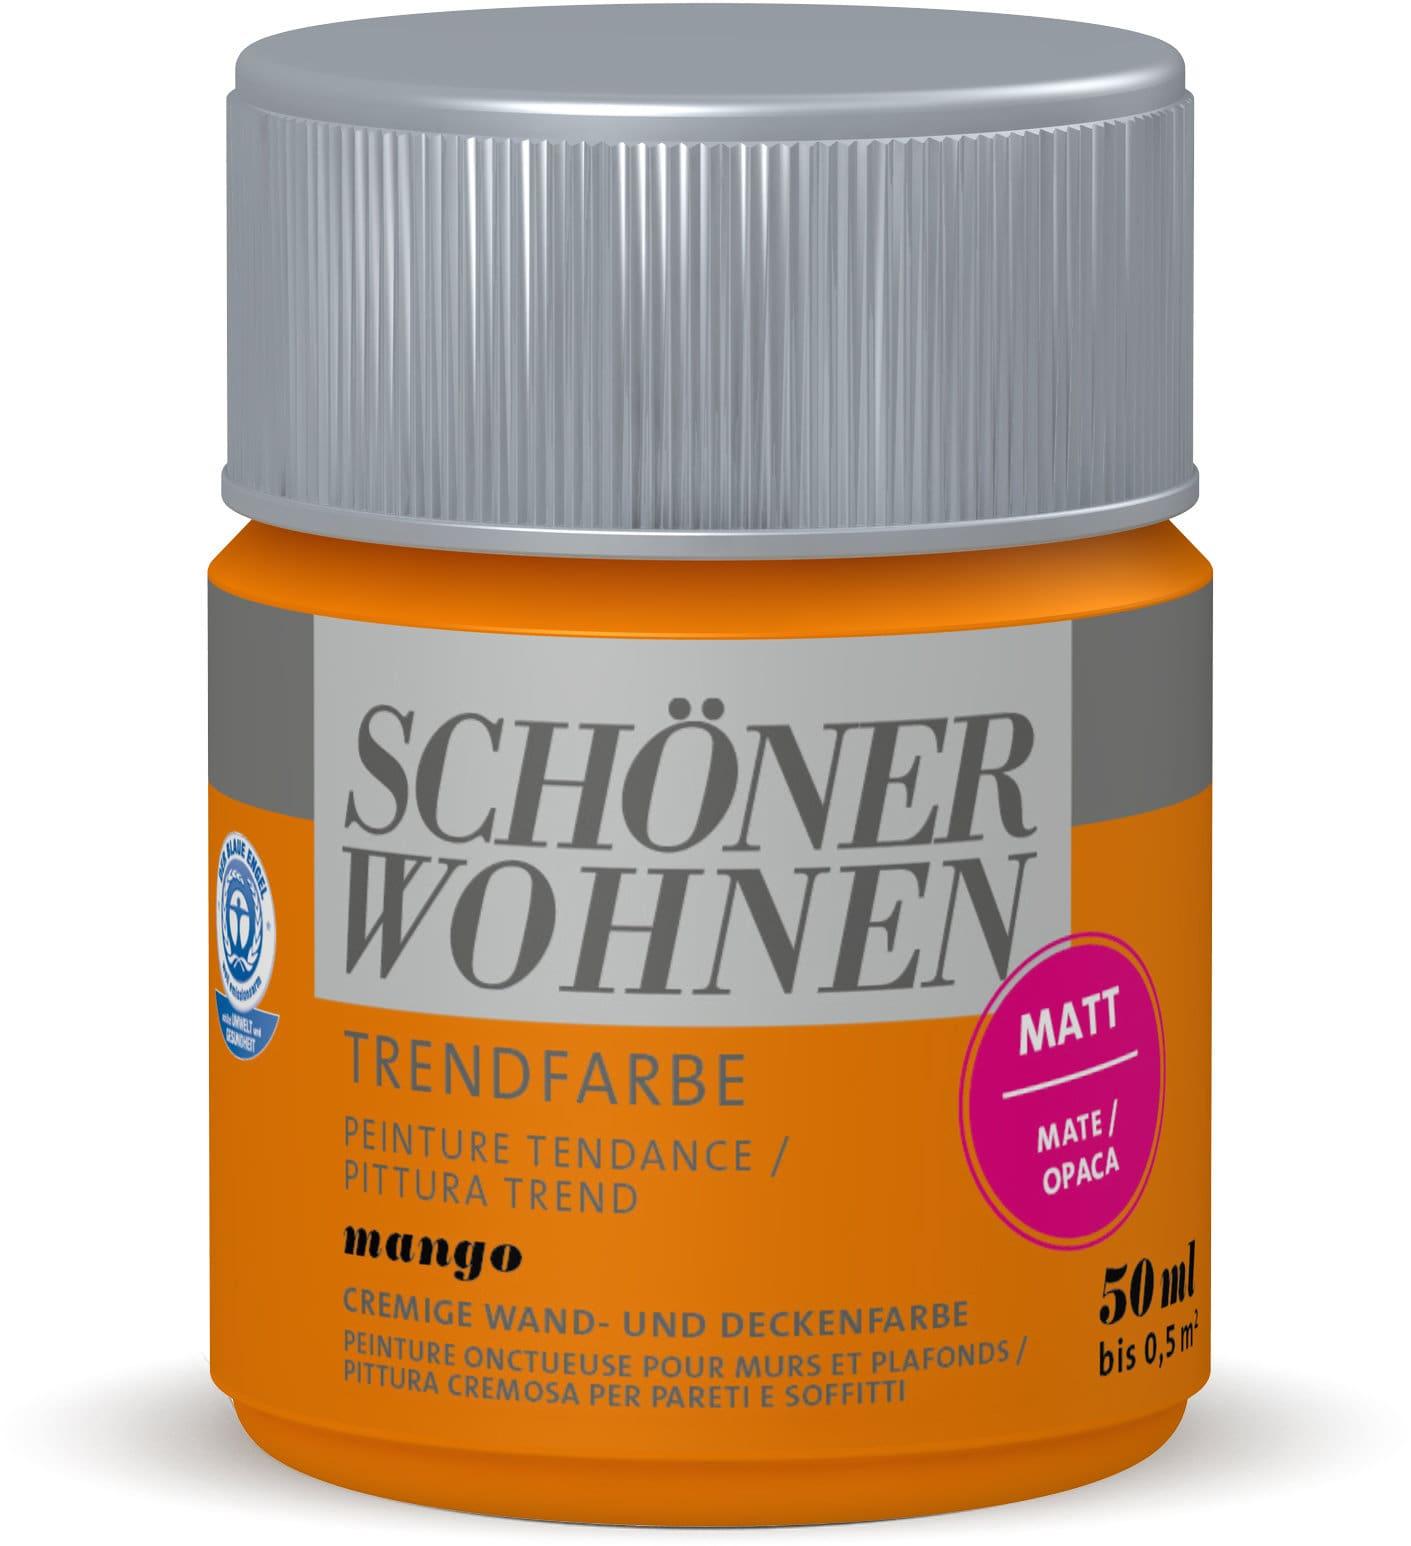 Schöner Wohnen Testeur de couleur tendance Mangue 50 ml